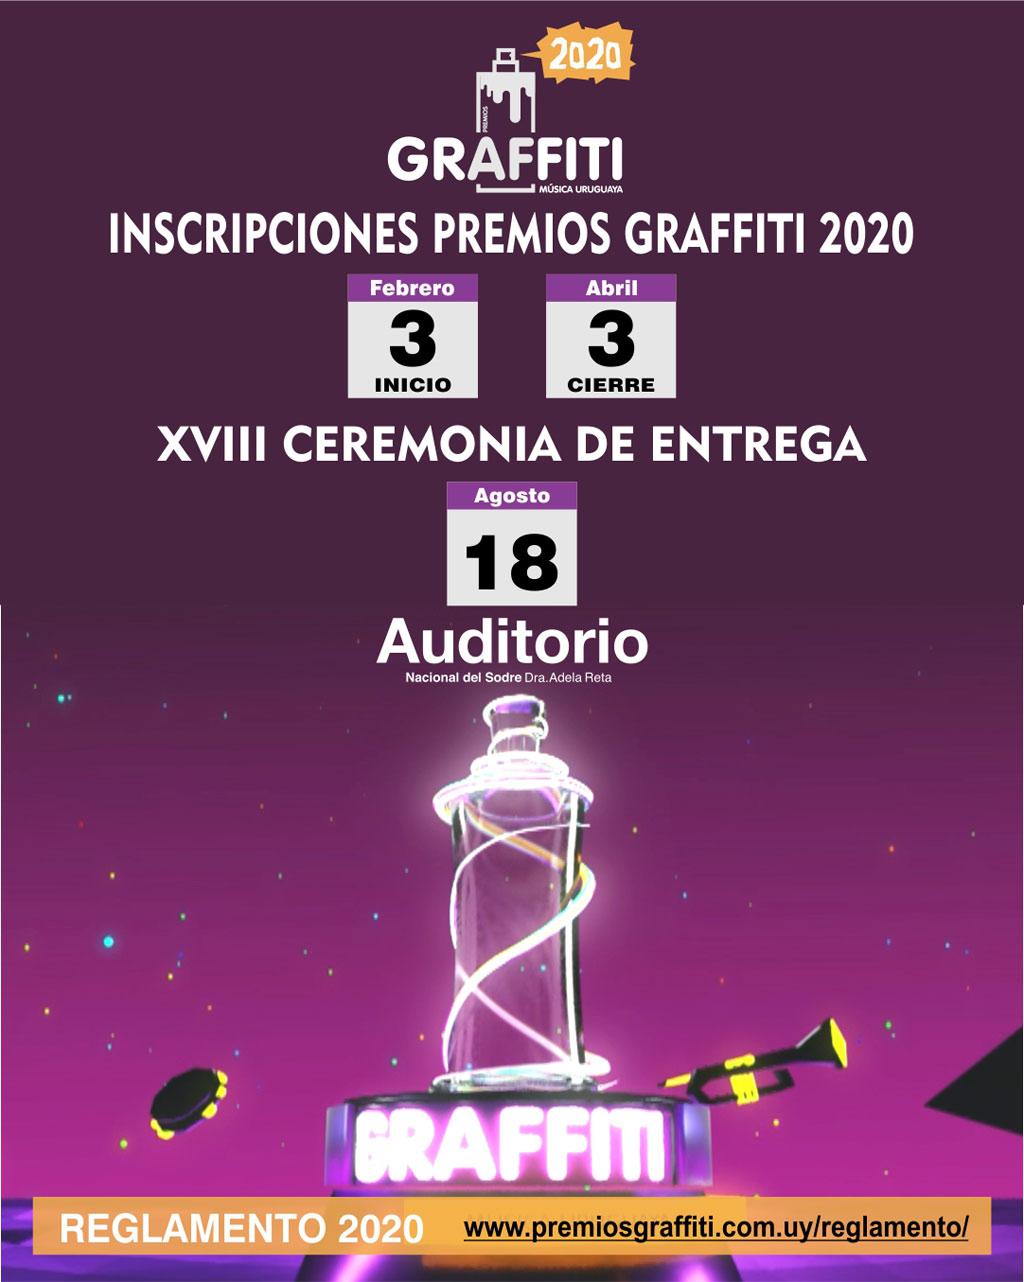 Premios Graffiti 2020